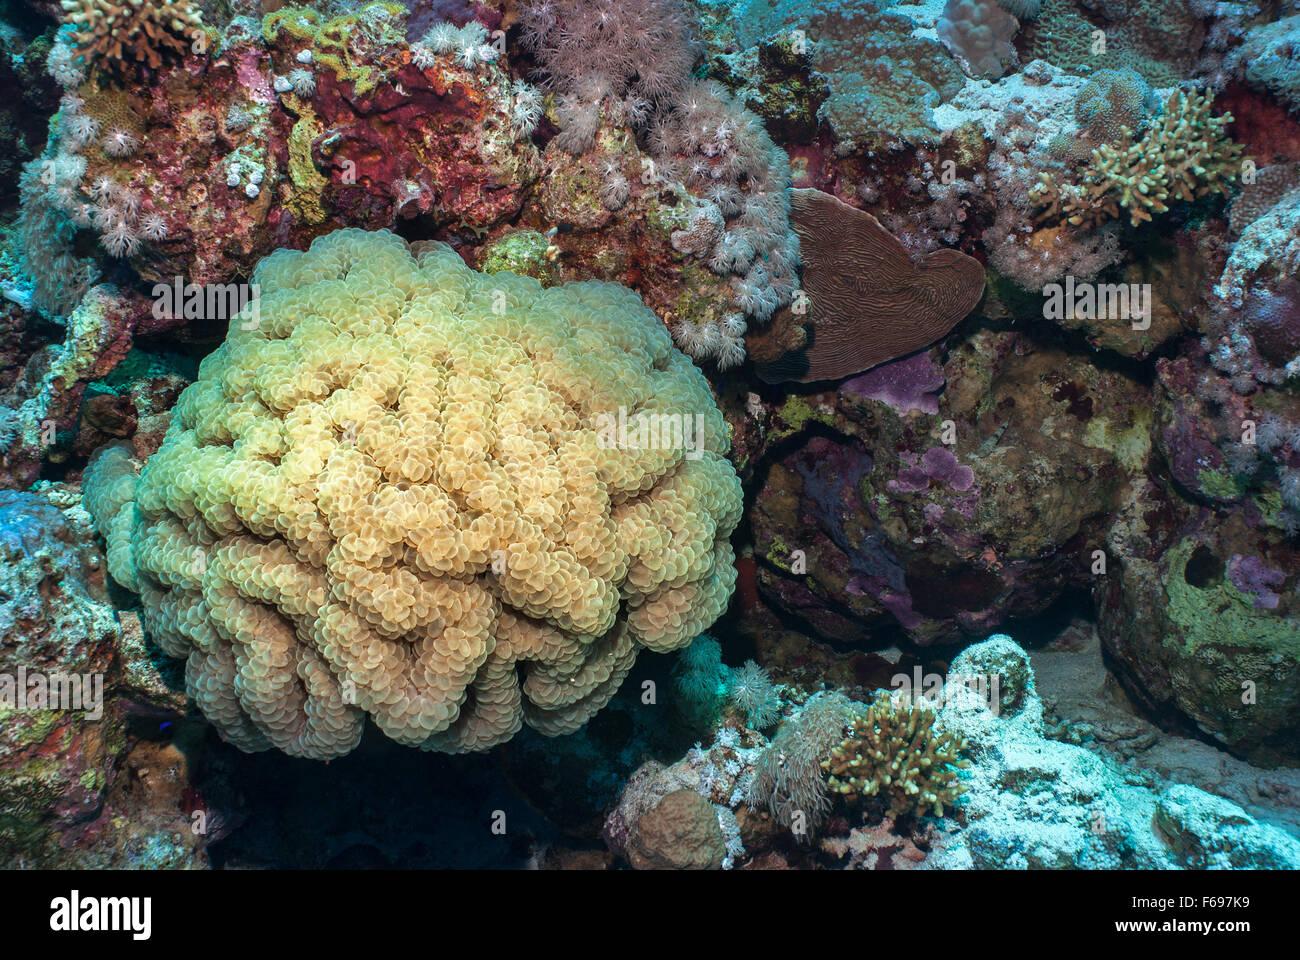 Plerogyra sinuosa corail, bulle, Caryophylliidae, Sharm el Sheikh, Mer Rouge, Egypte Photo Stock